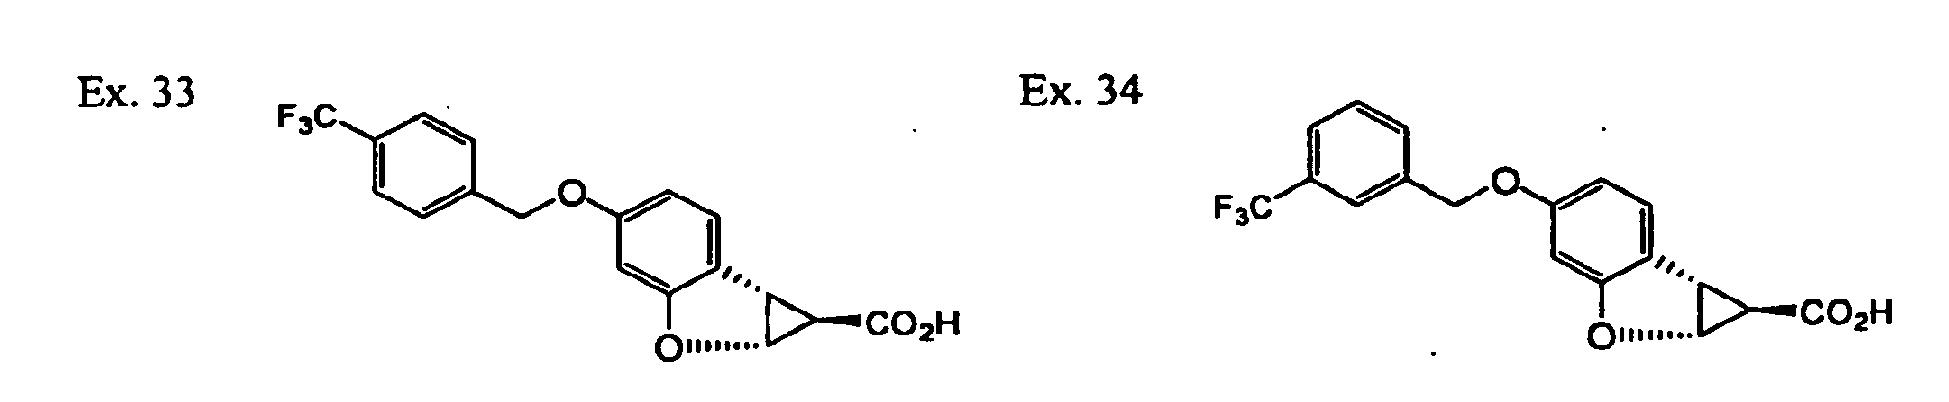 Figure imgb0183